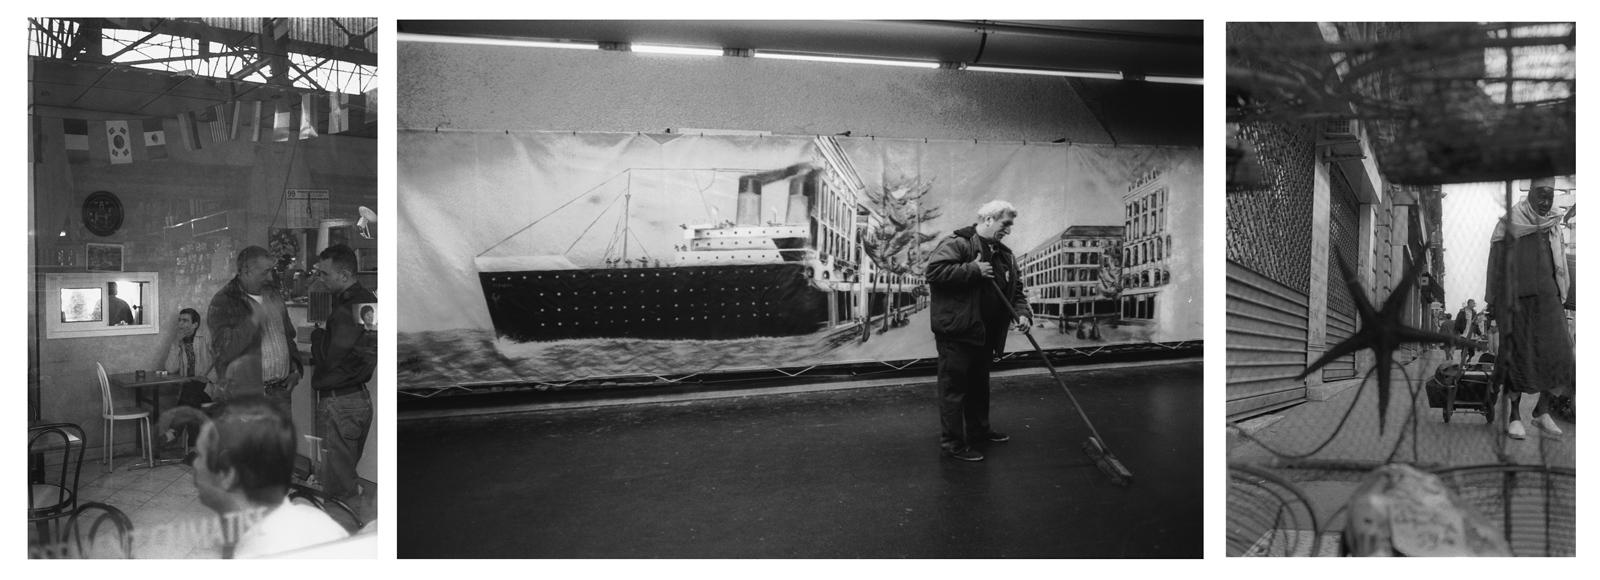 Art and Documentary Photography - Loading 07_Marseille___Fabio_Sgroi.jpg